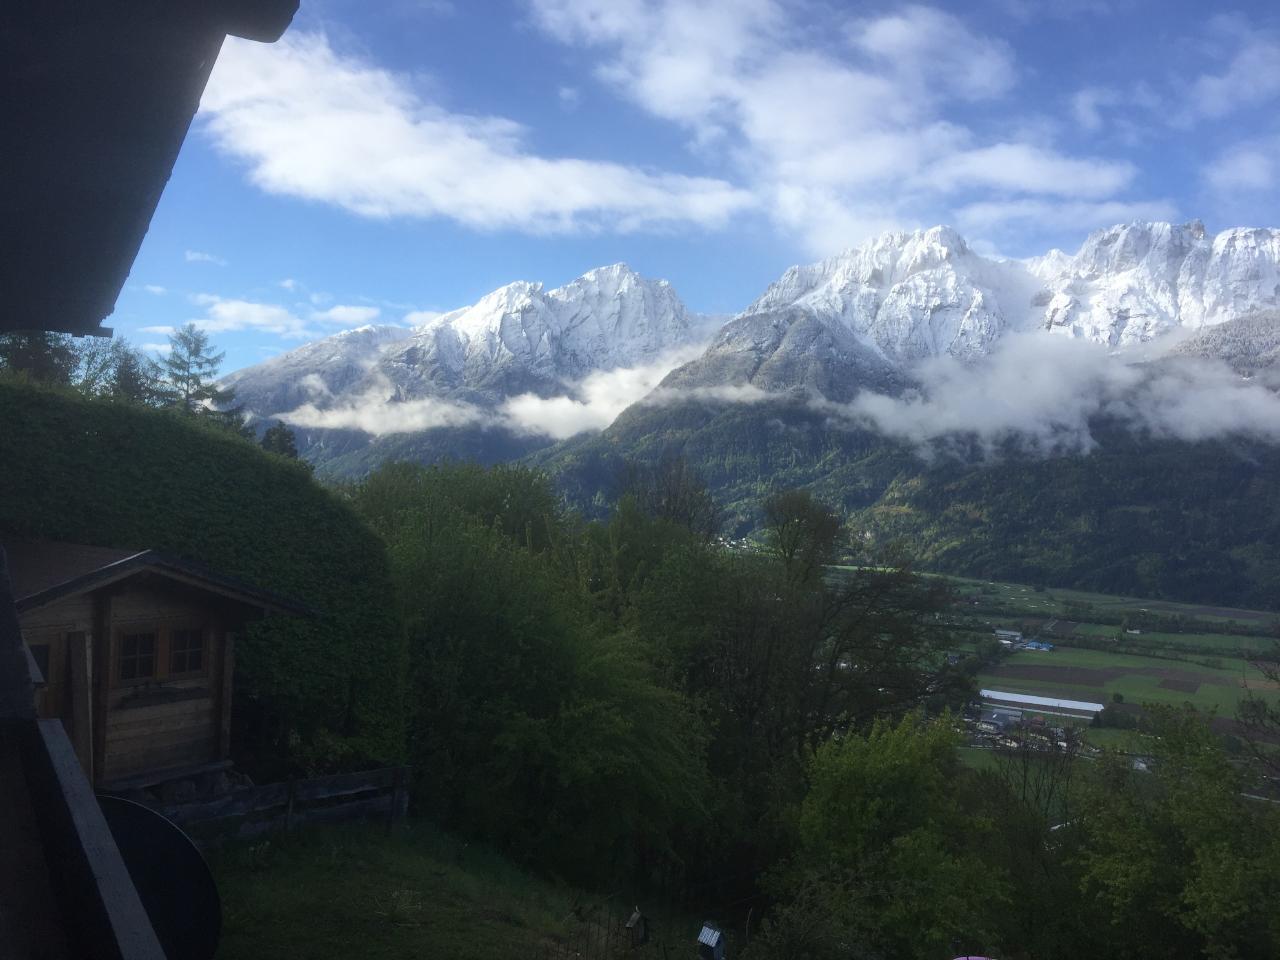 Maison de vacances Landhaus Osttirol (2299545), Dölsach, Osttirol, Tyrol, Autriche, image 33